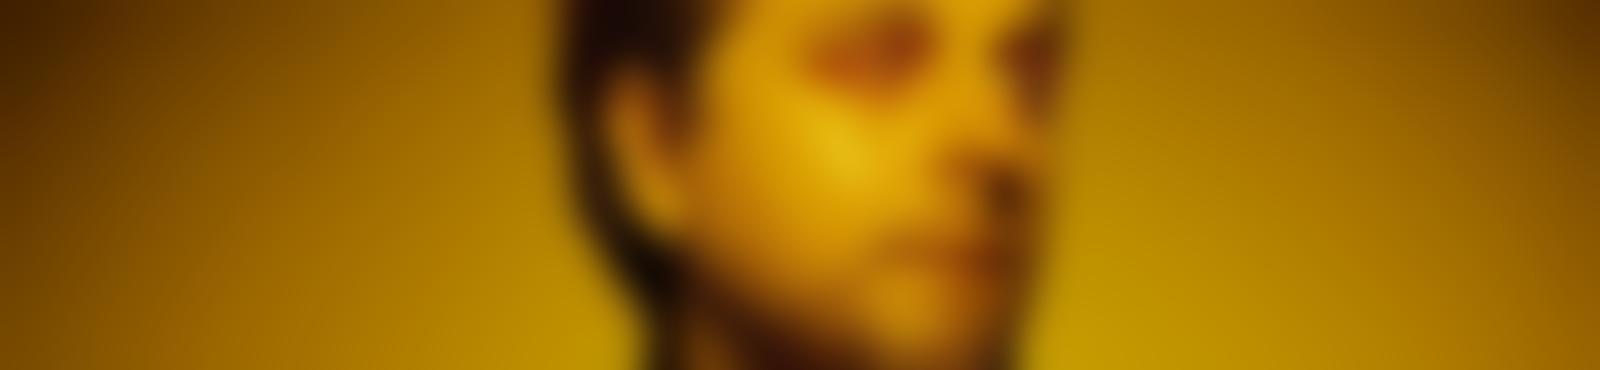 Blurred d721e510 6020 4e89 93ba eaa6d5317f98